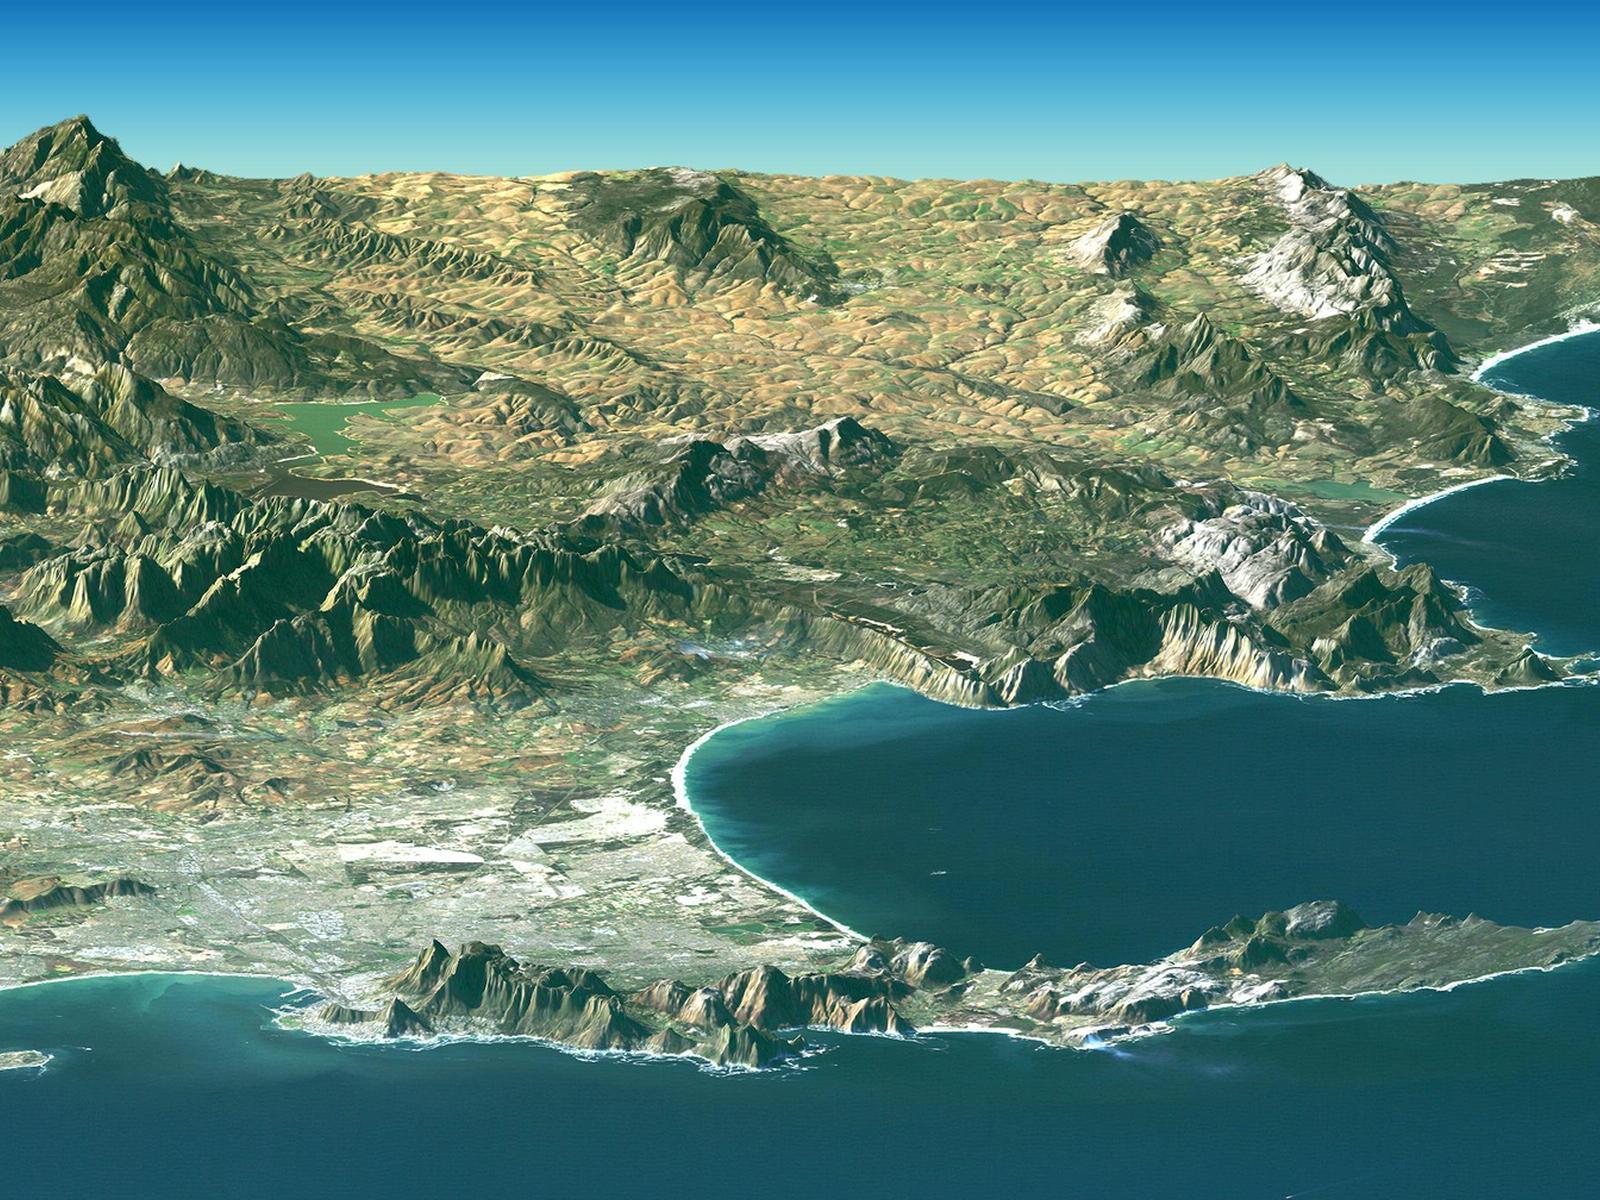 Landsat Image of Cape Town, South Africa